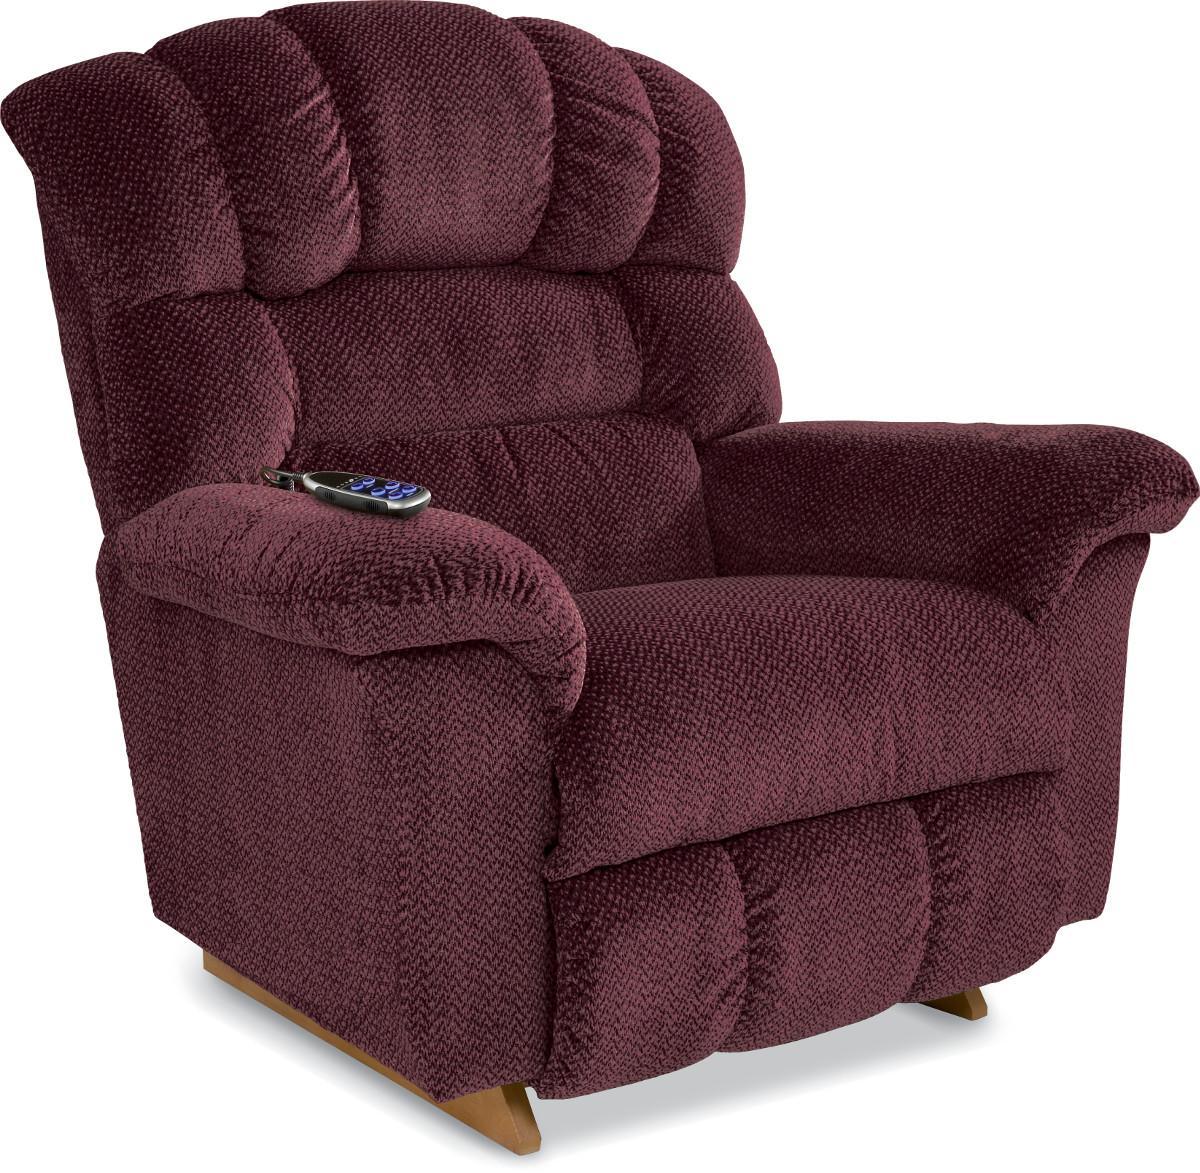 la z boy lift chair parts northwest territory chairs crandell power recline xr reclina rocker reclining